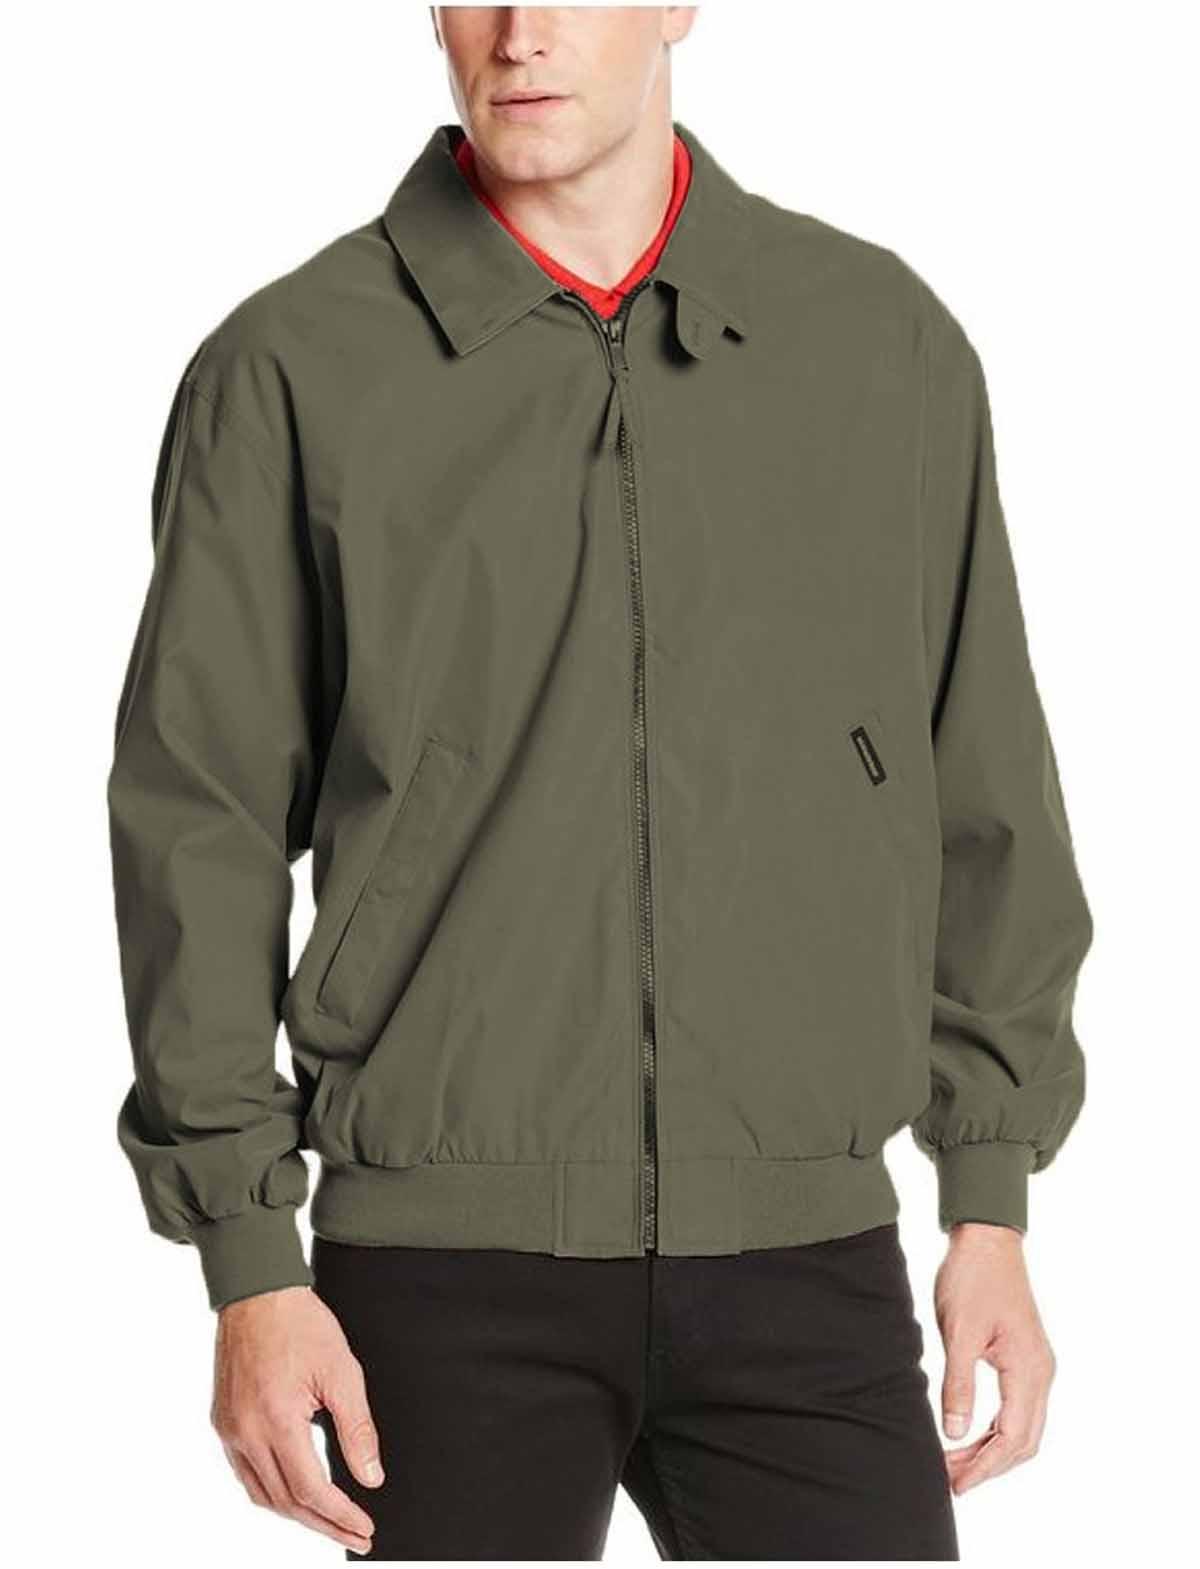 Weatherproof garment company leather jacket